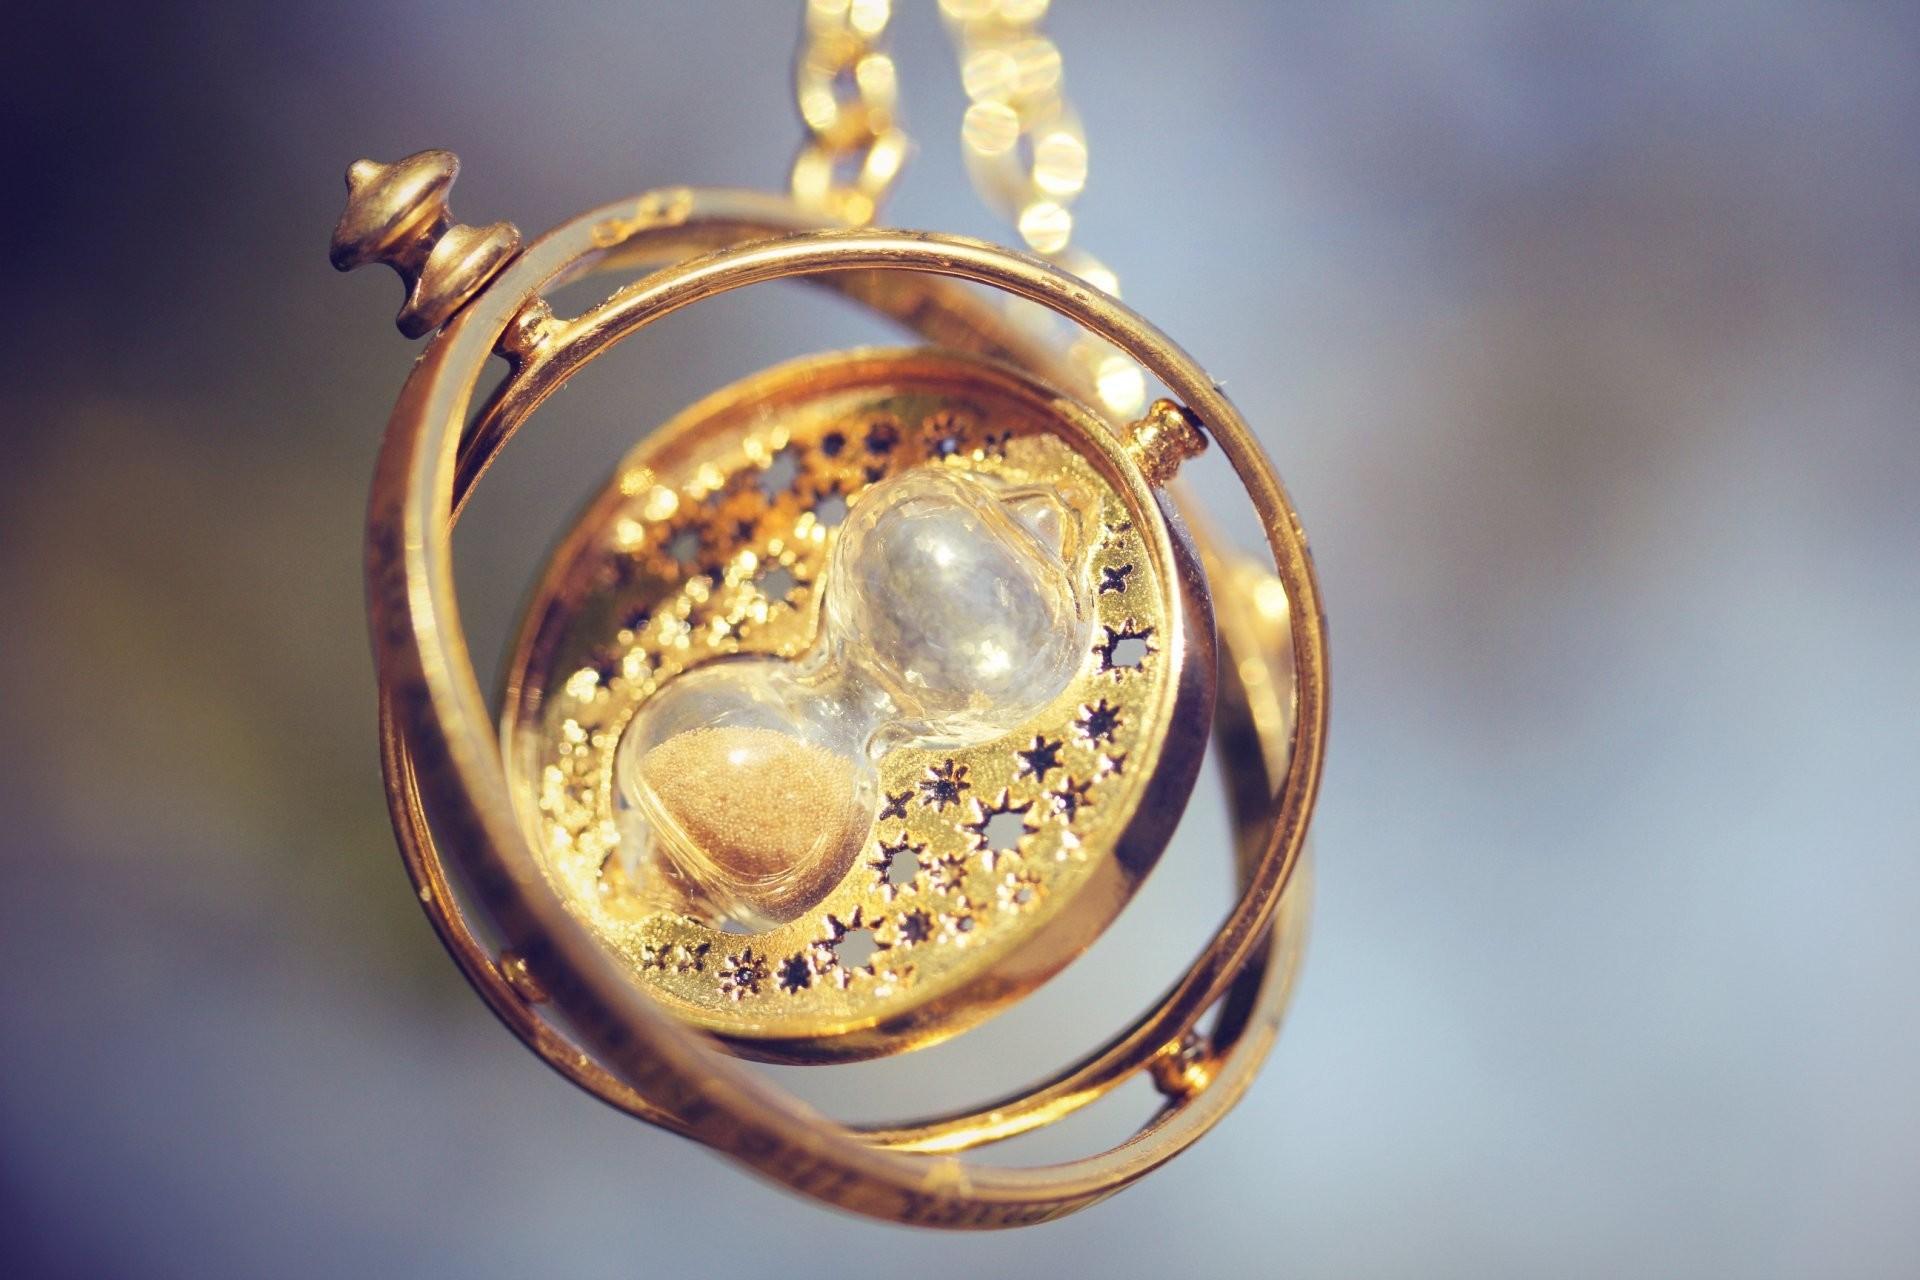 Res: 1920x1280, hourglass pendant close up decoration